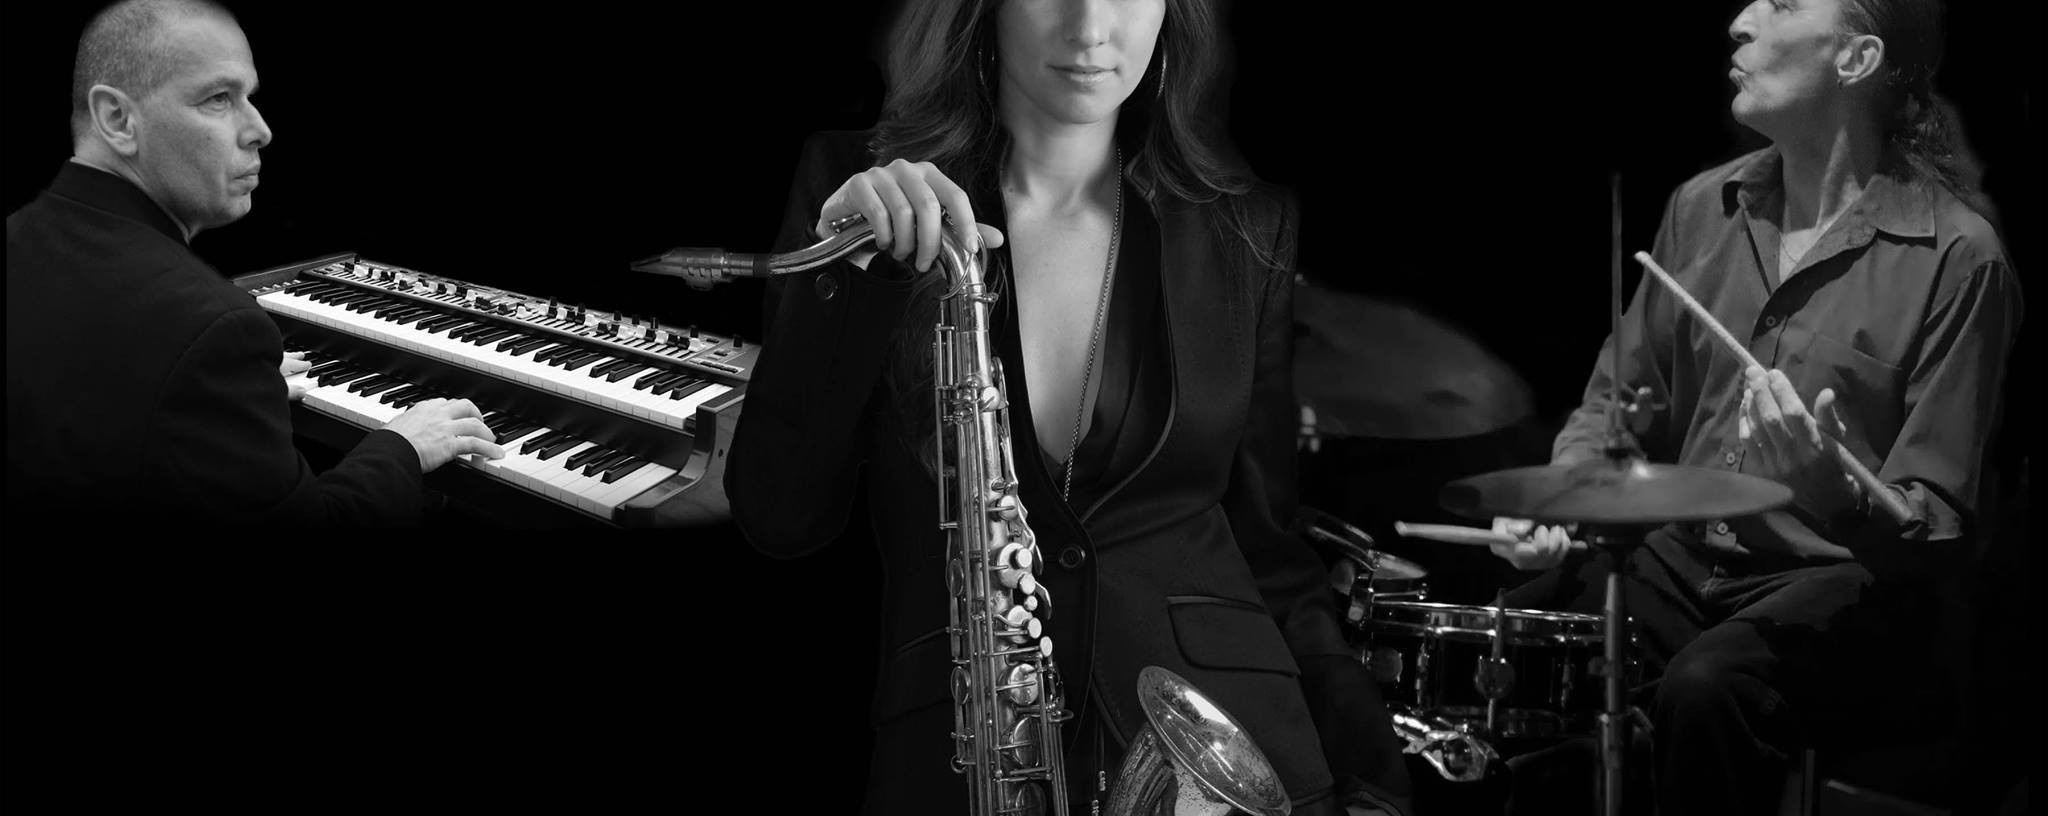 SINGJAZZ BOOGALOO: Nicole Duffell Organ Trio feat. Andrew Lim